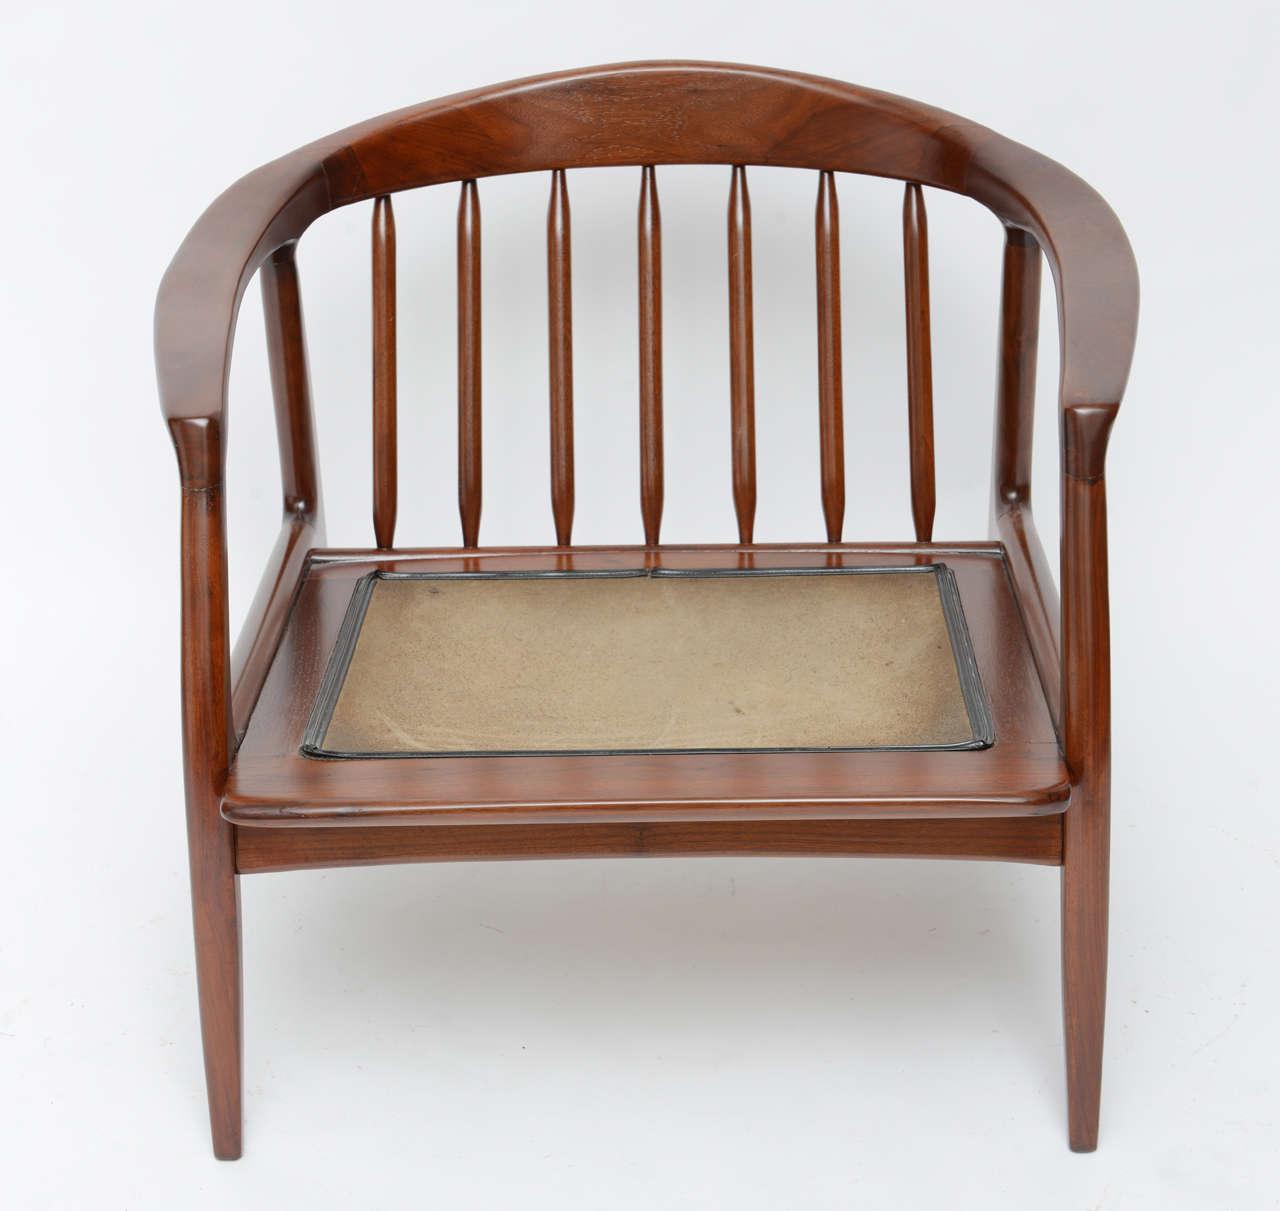 spindle arm chair dicks beach chairs milo baughman wood at 1stdibs